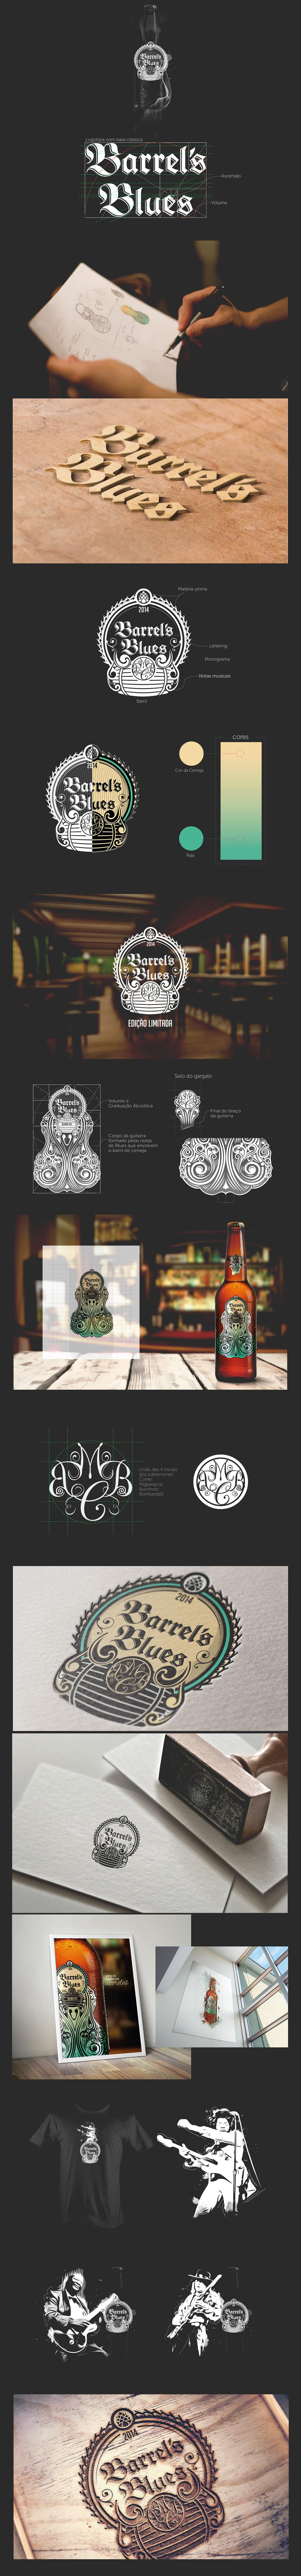 Barrel's Blues beer Bier Birra Cerveja rótulo marca blues musica music blues barrel barril artesanal bbking